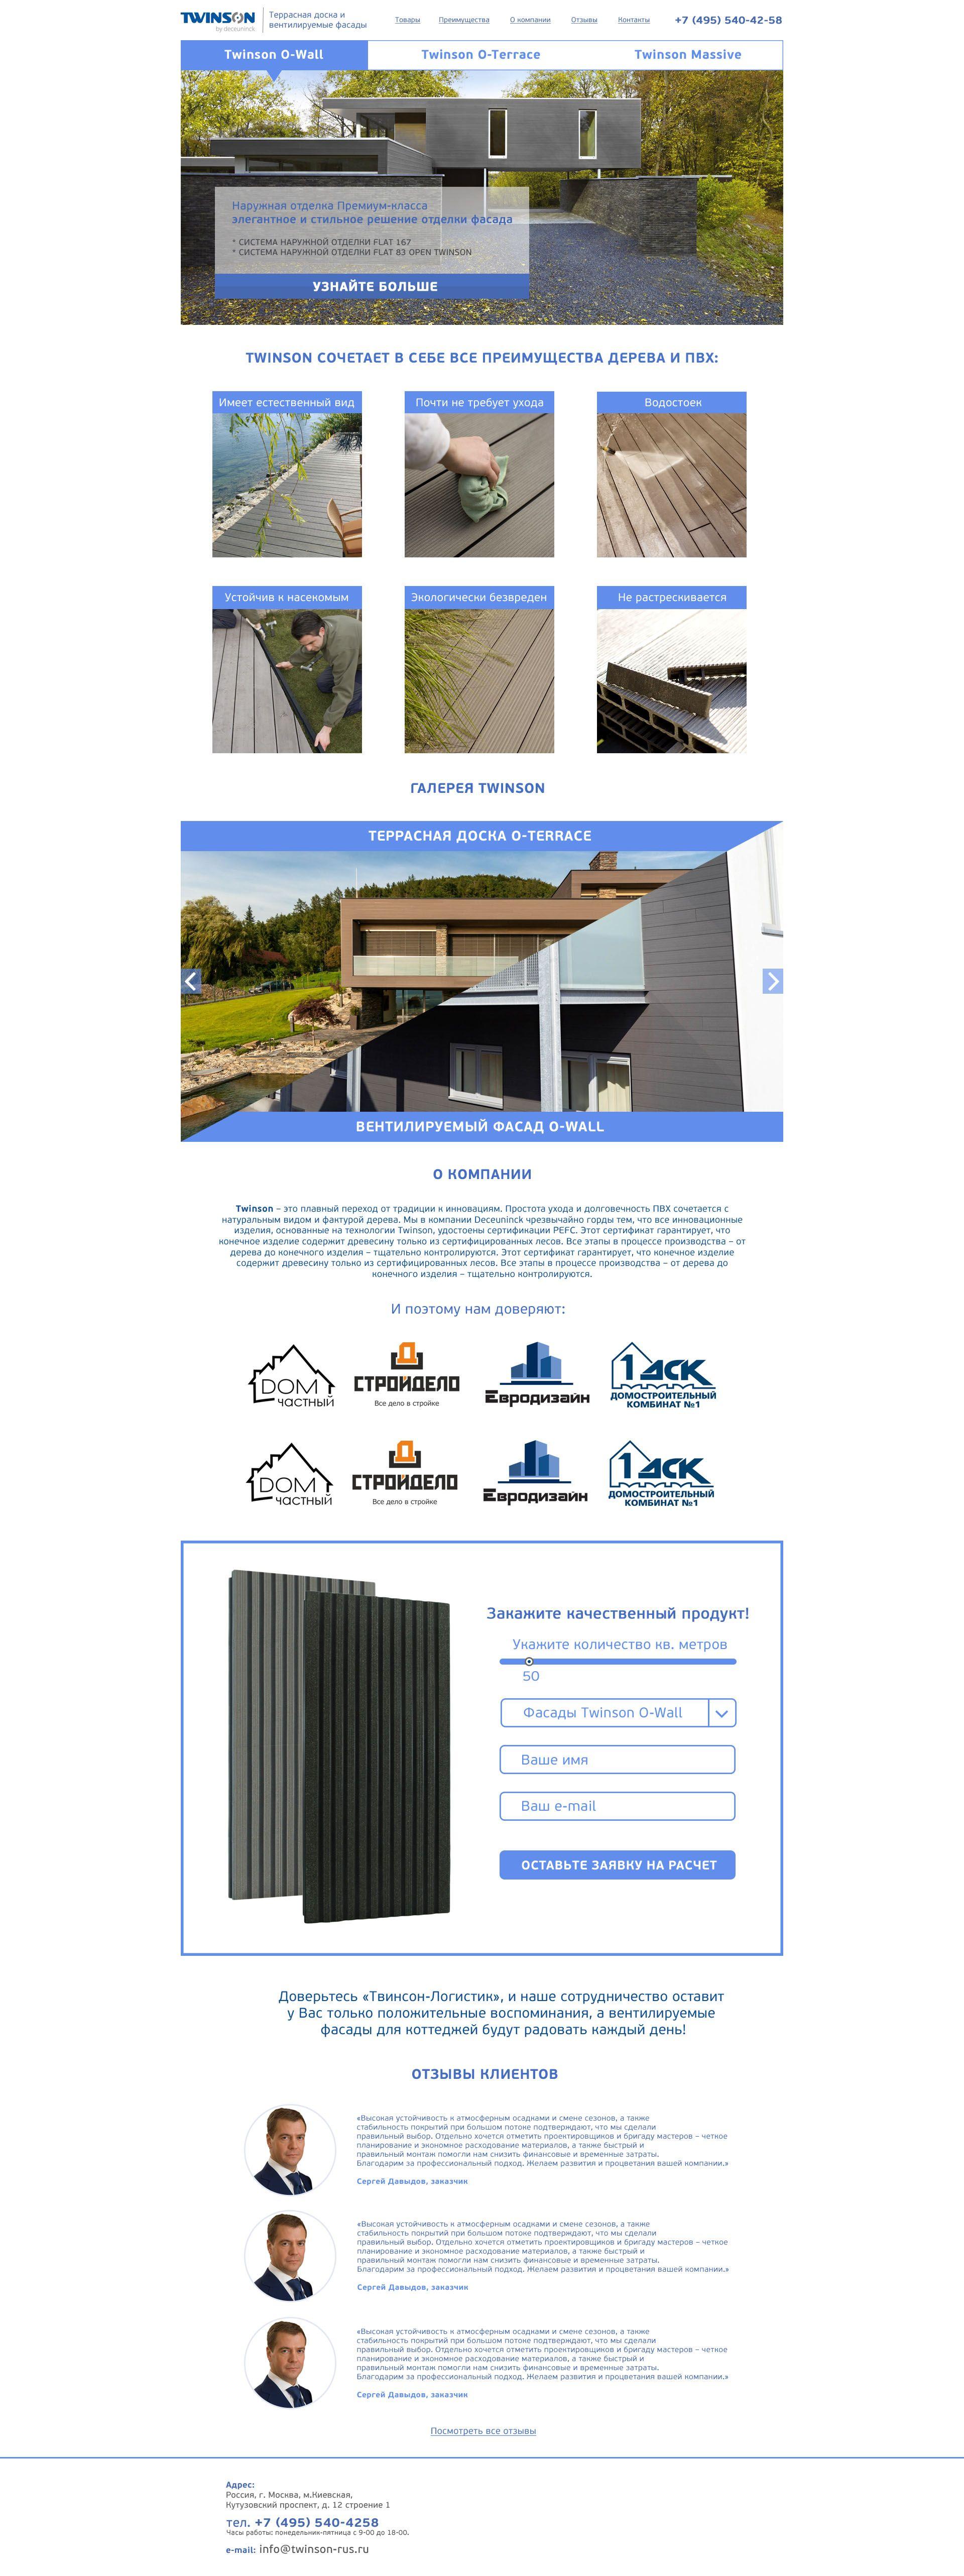 Веб-сайт для twinson-rus.ru - дизайнер aileen3